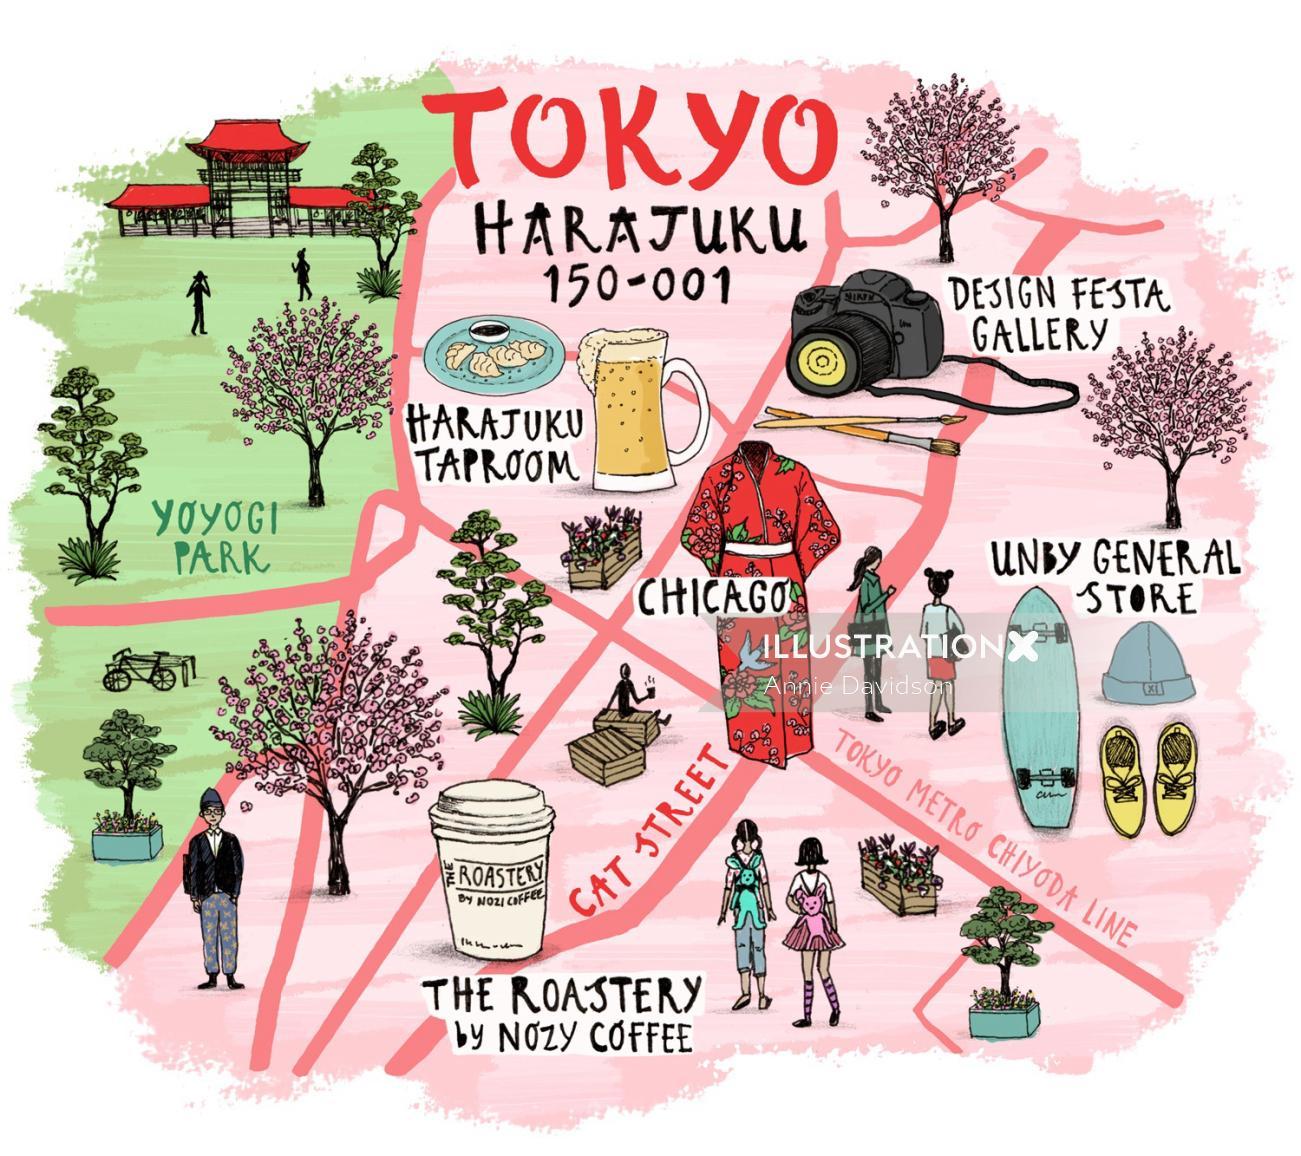 Graphic Design of Tokyo Harajuku Map